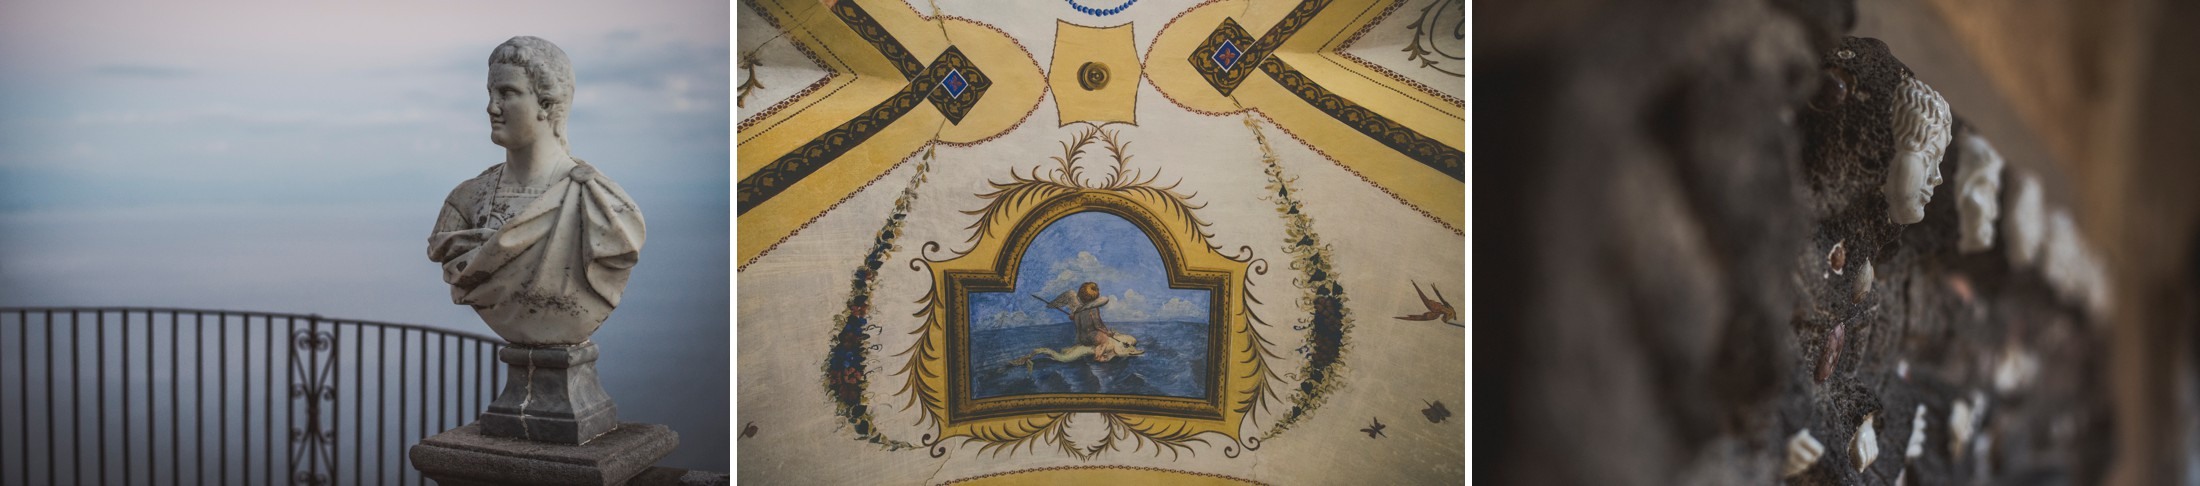 villa cimbrone details